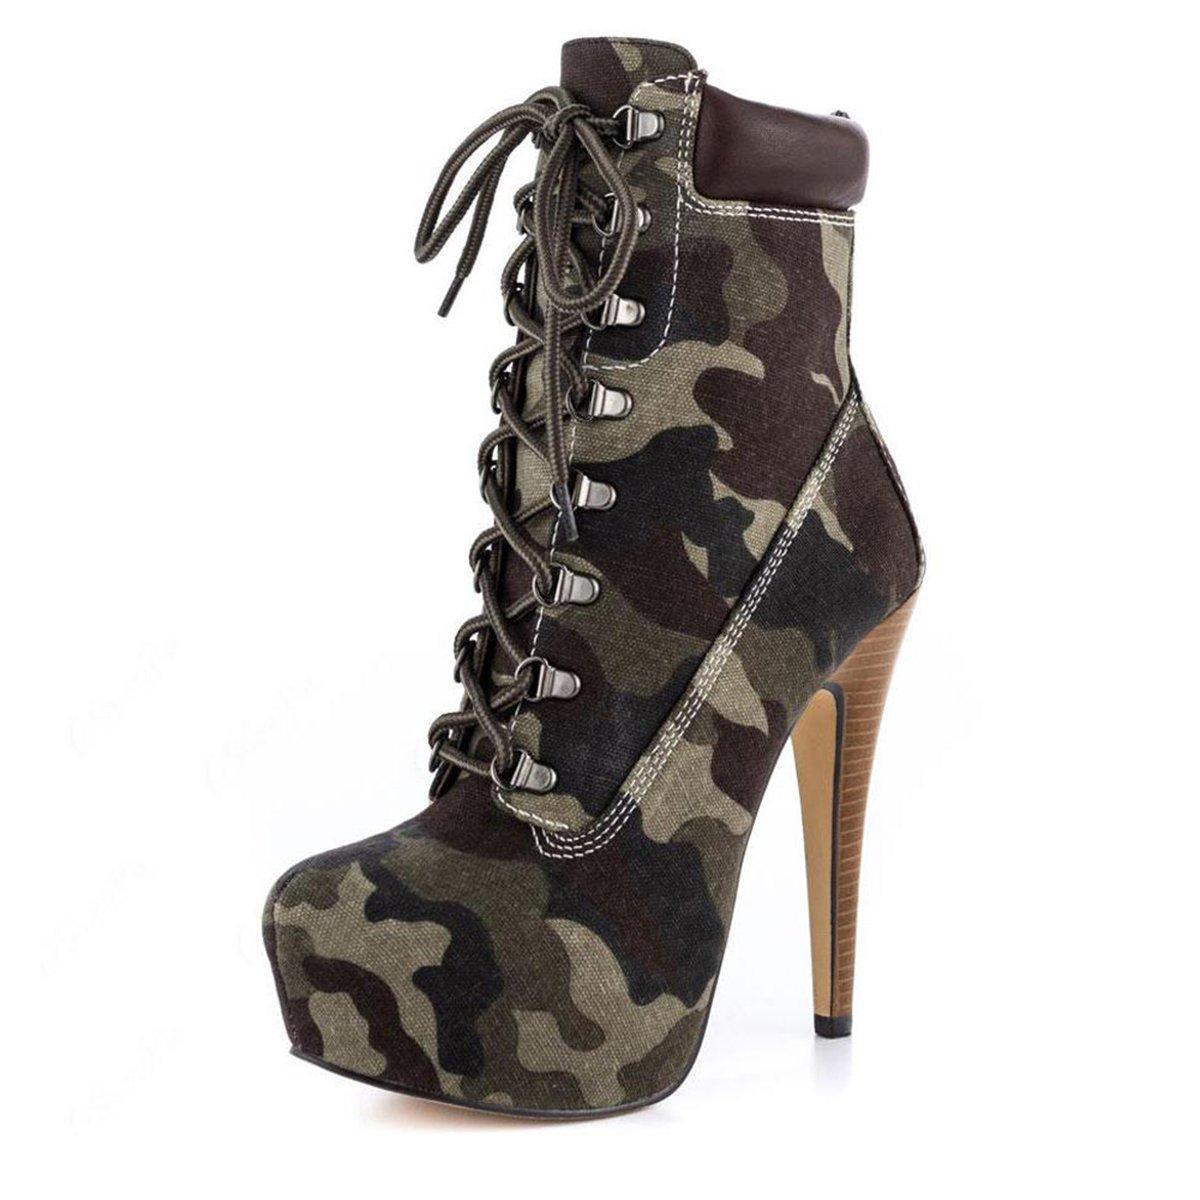 Onlymaker Damen Stiefel Pumps Boots Kurzschaft Stiefeletten Zehenkappe High Heels  37 EU|dunkelcamouflage